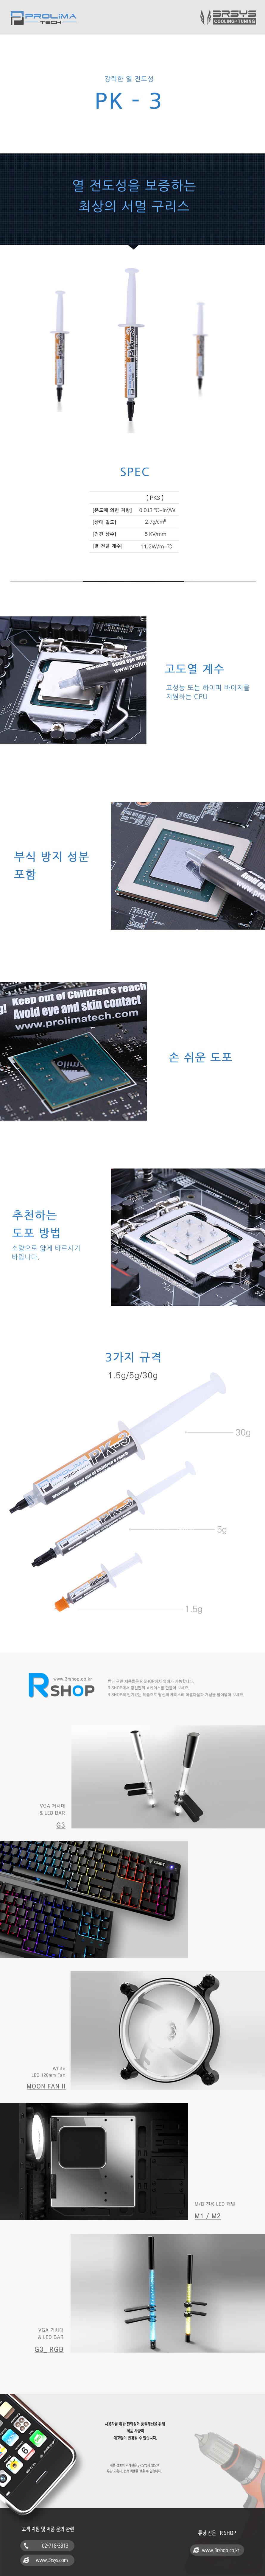 PROLIMATECH  PK-3 new Nano Aluminum 3R(1.5g)